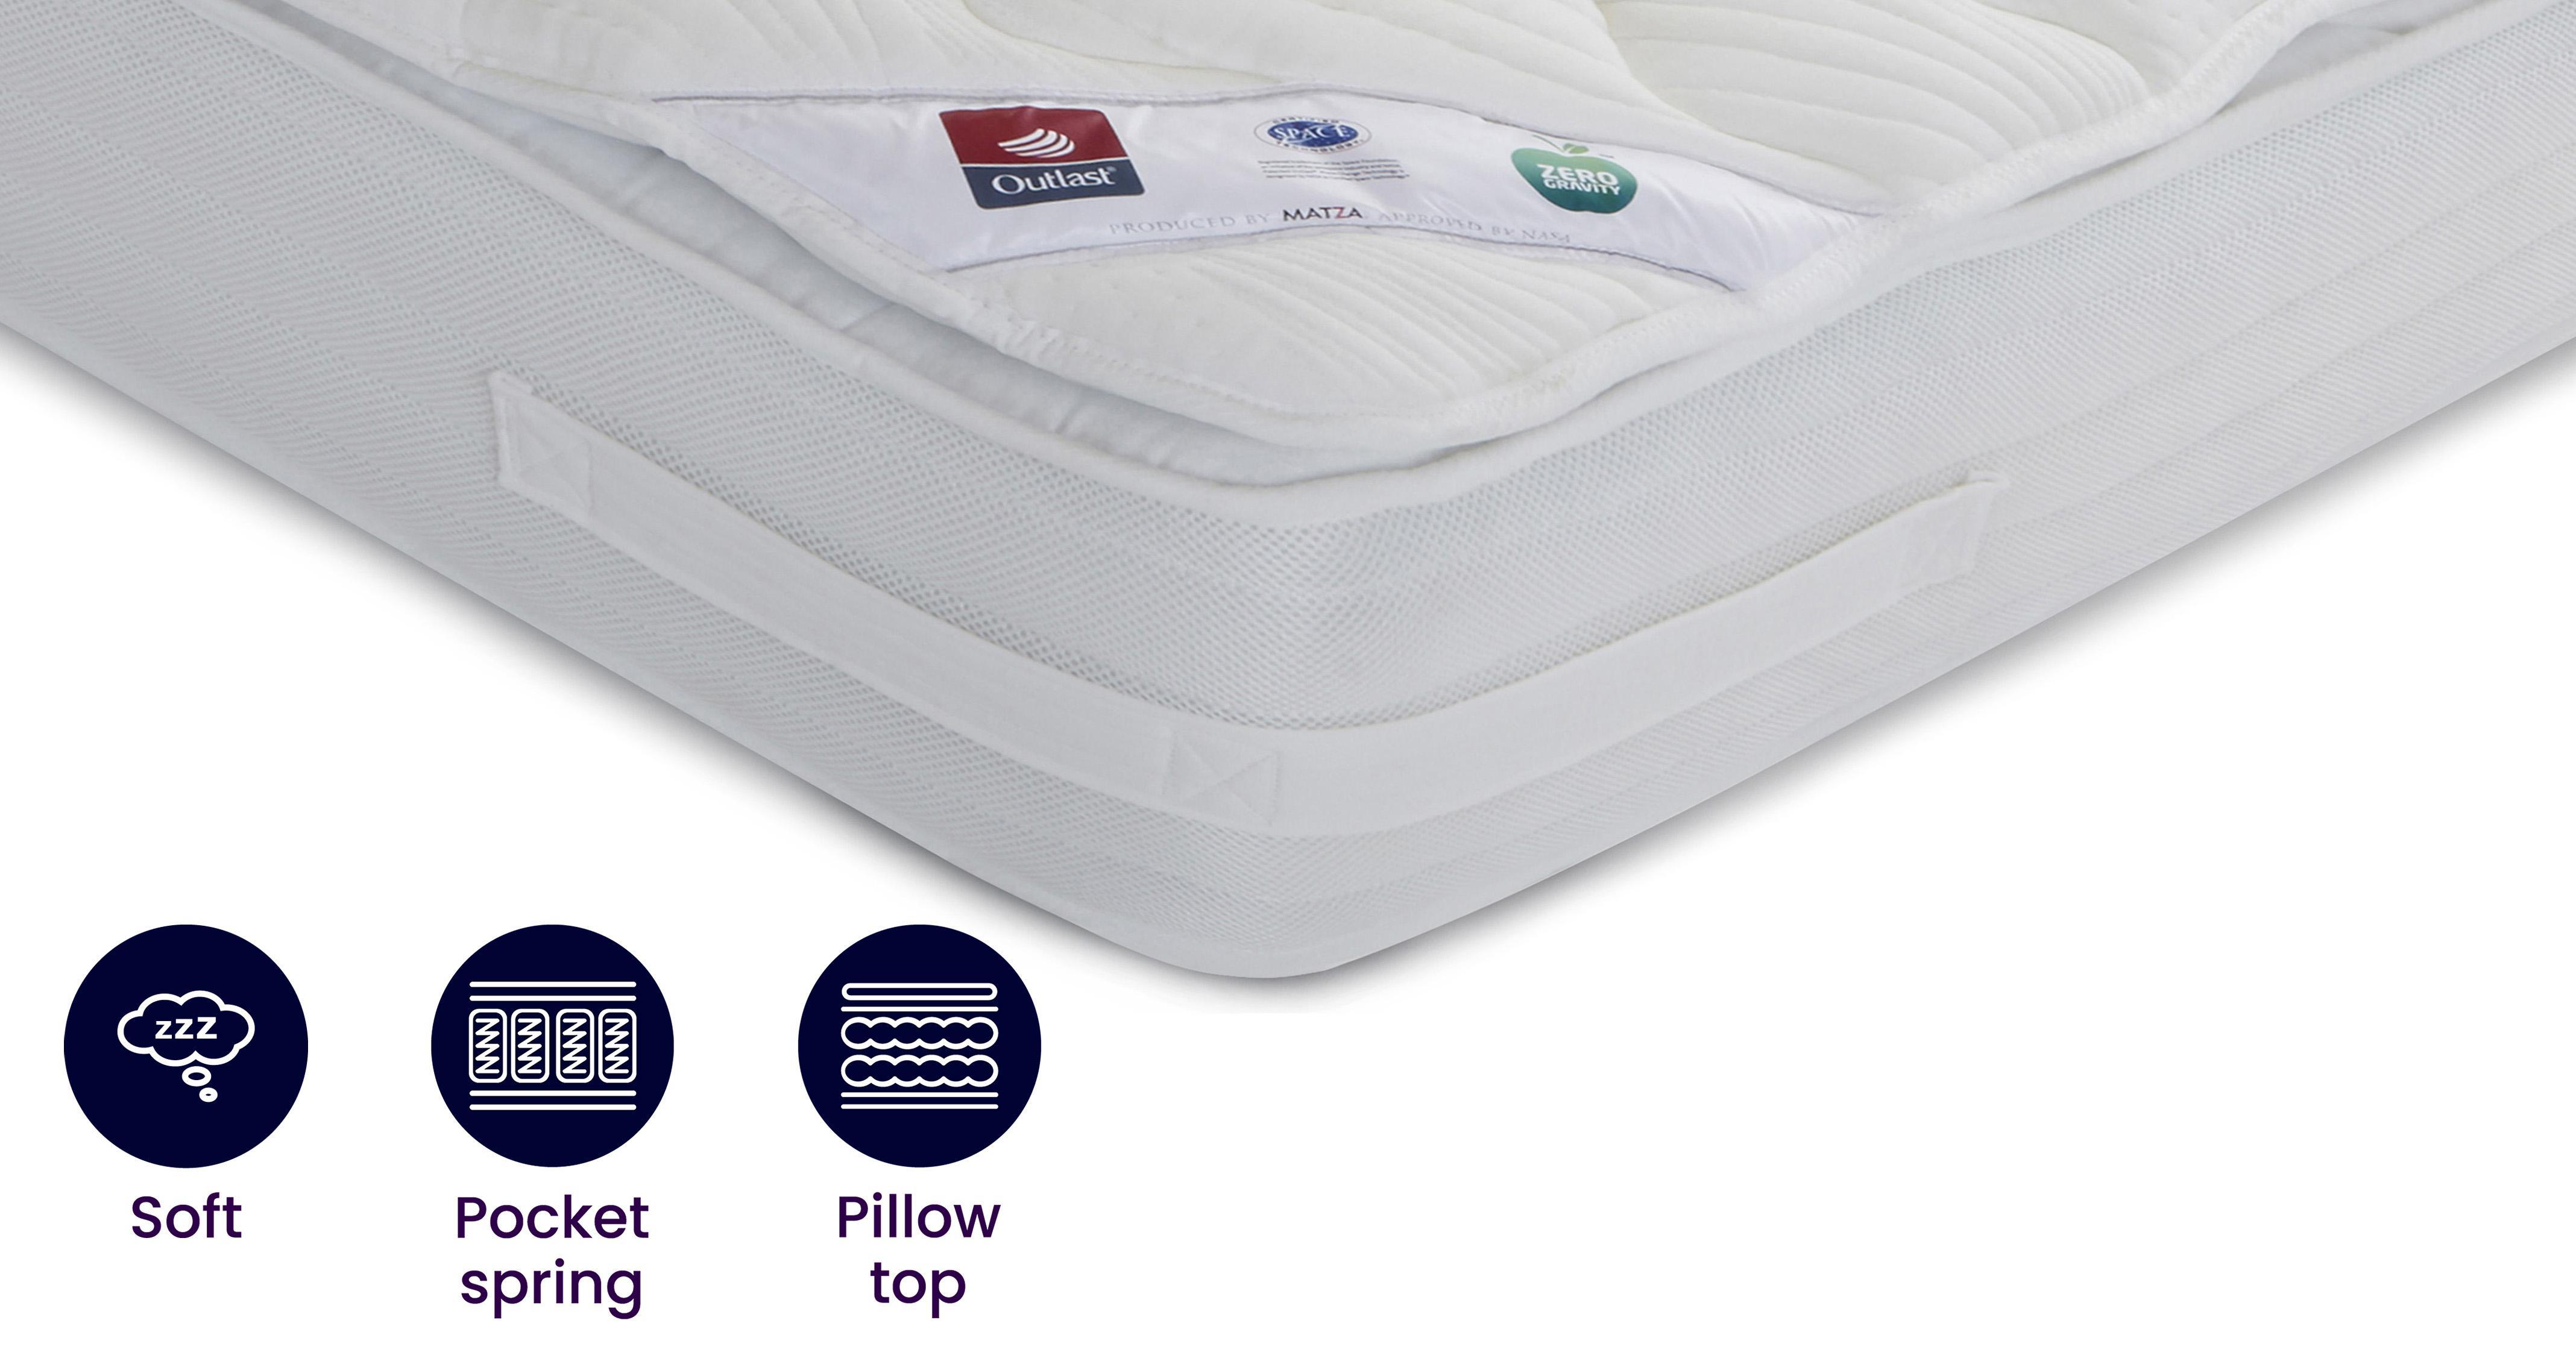 inspirational topper mattress jeseniacoant xl unique size rx fort pics twin queen orthopedic of tempurpedic elegant